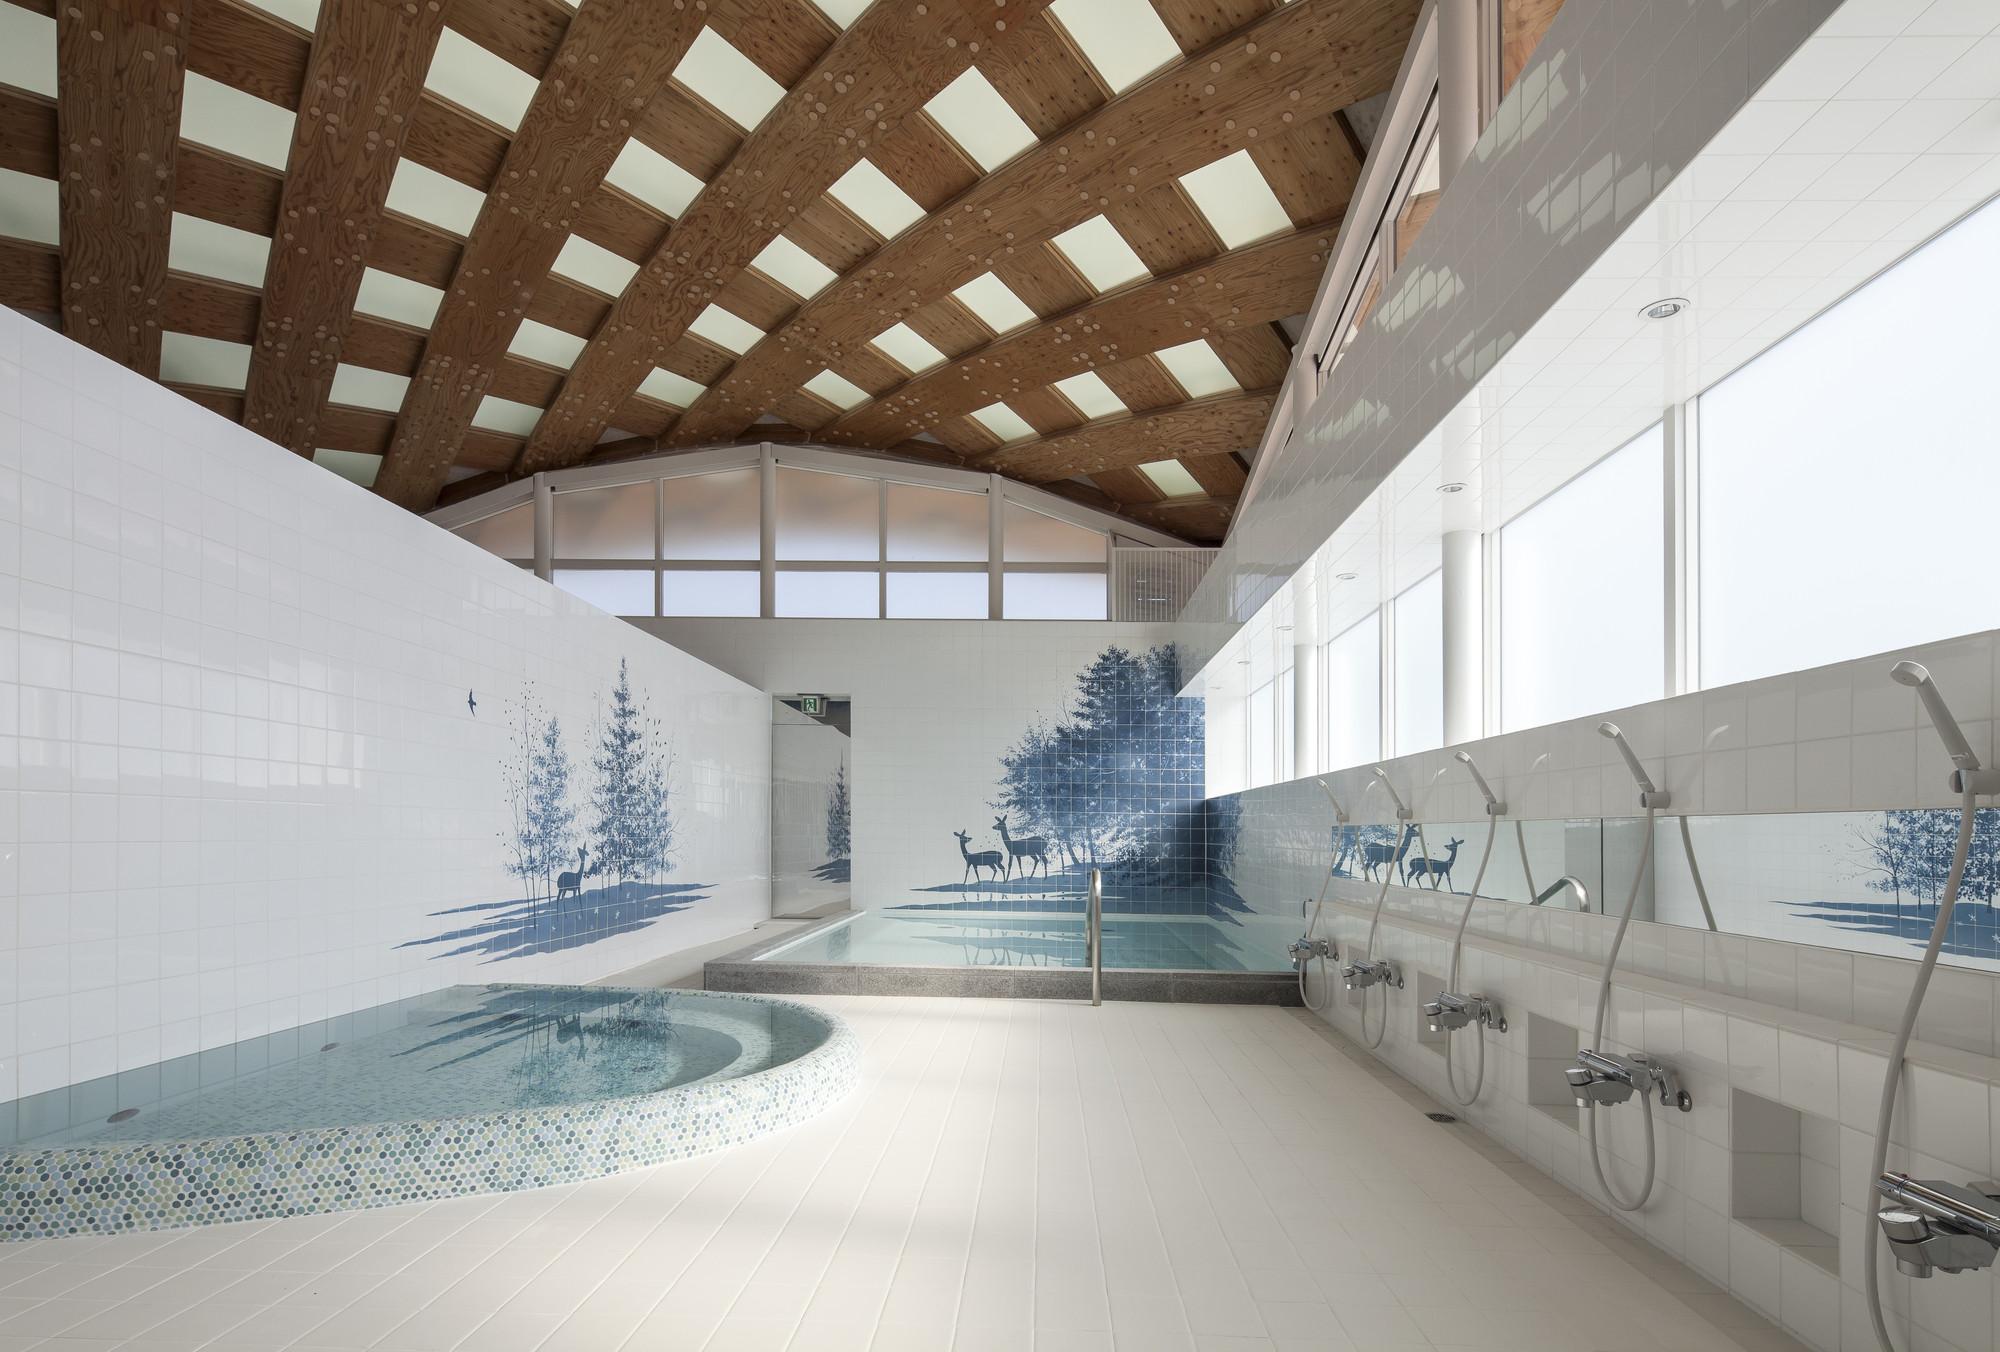 Estación JR Onagawa / Shigeru Ban Architects, © Hiroyuki Hirai